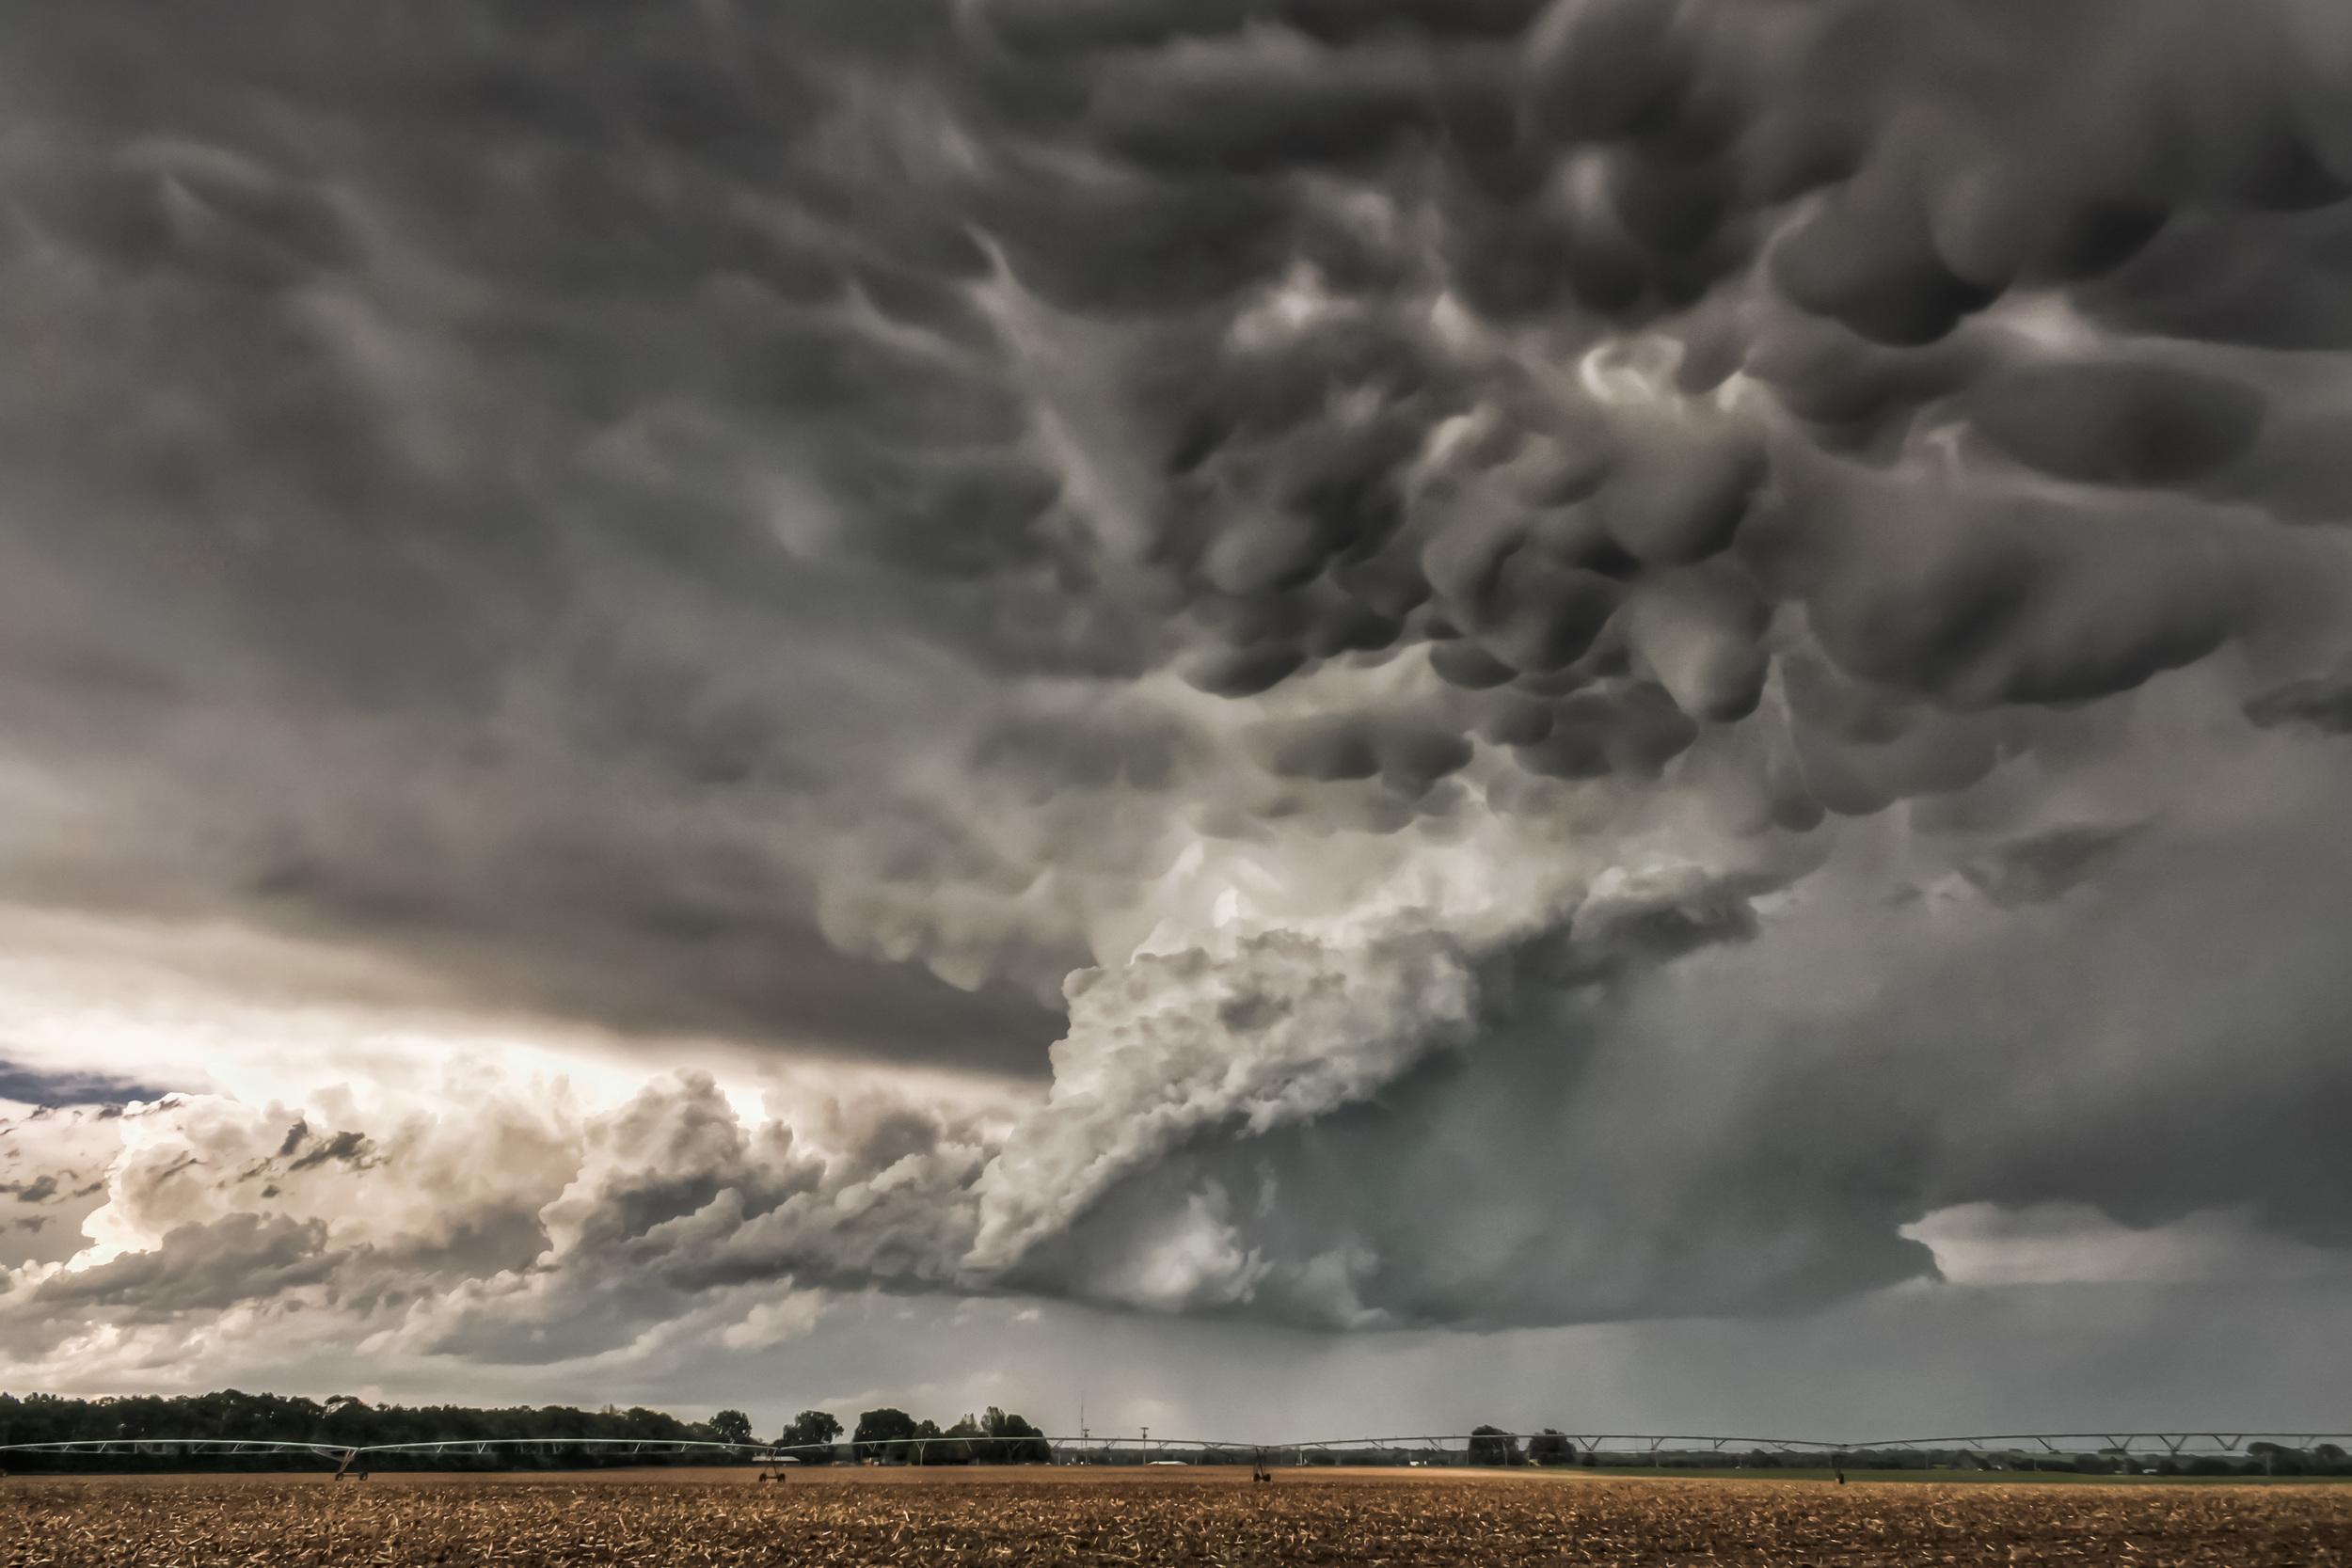 Supercell near Topeka, Kansas on May 21, 2011